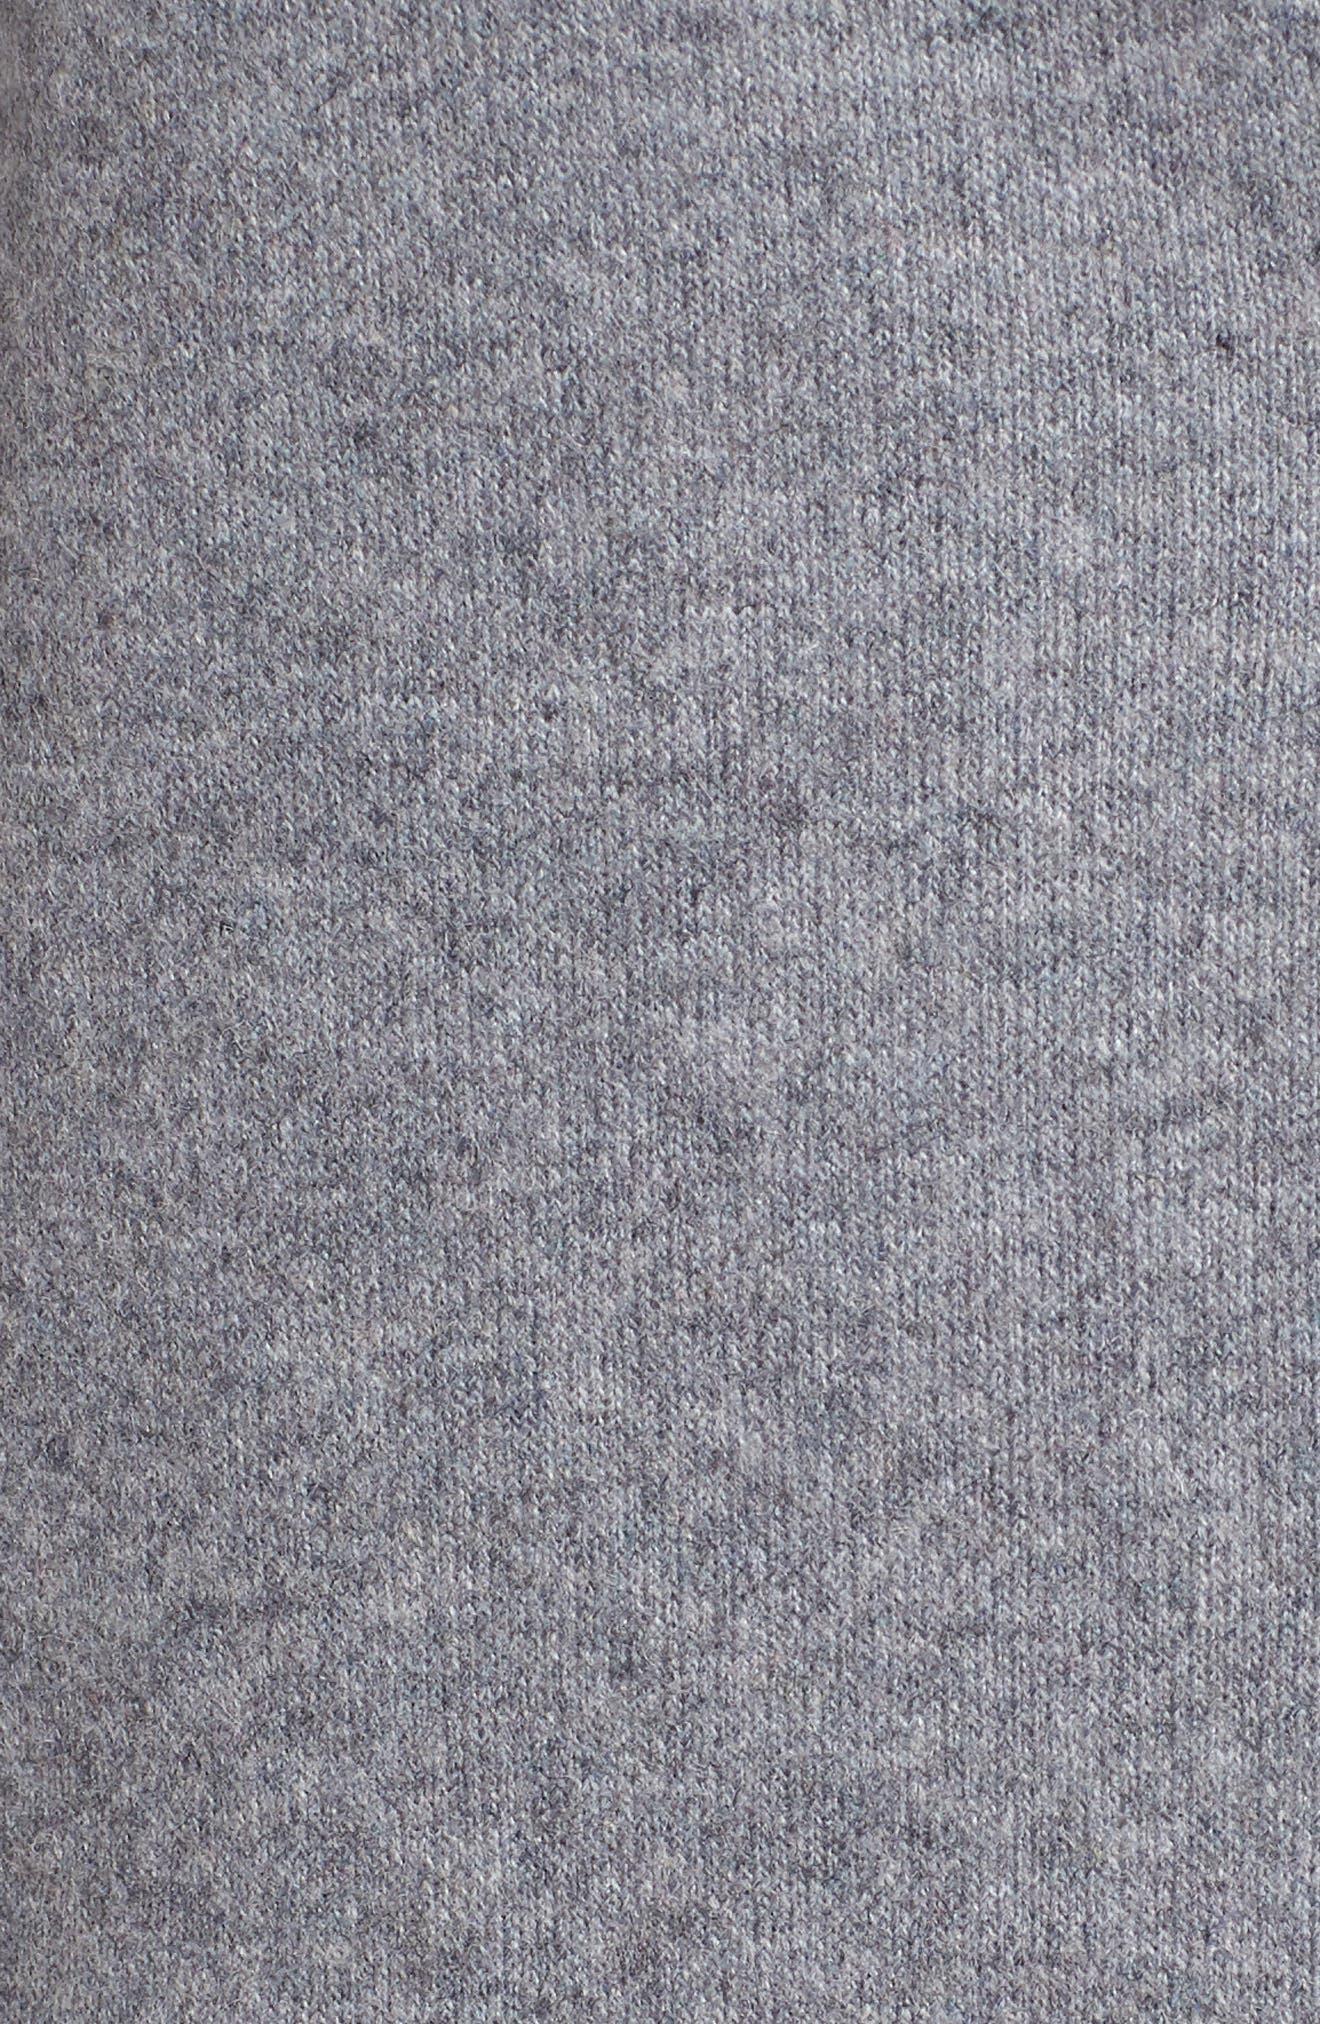 Envelope Collar Wool Blend Knit Coat,                             Alternate thumbnail 7, color,                             LIGHT GREY